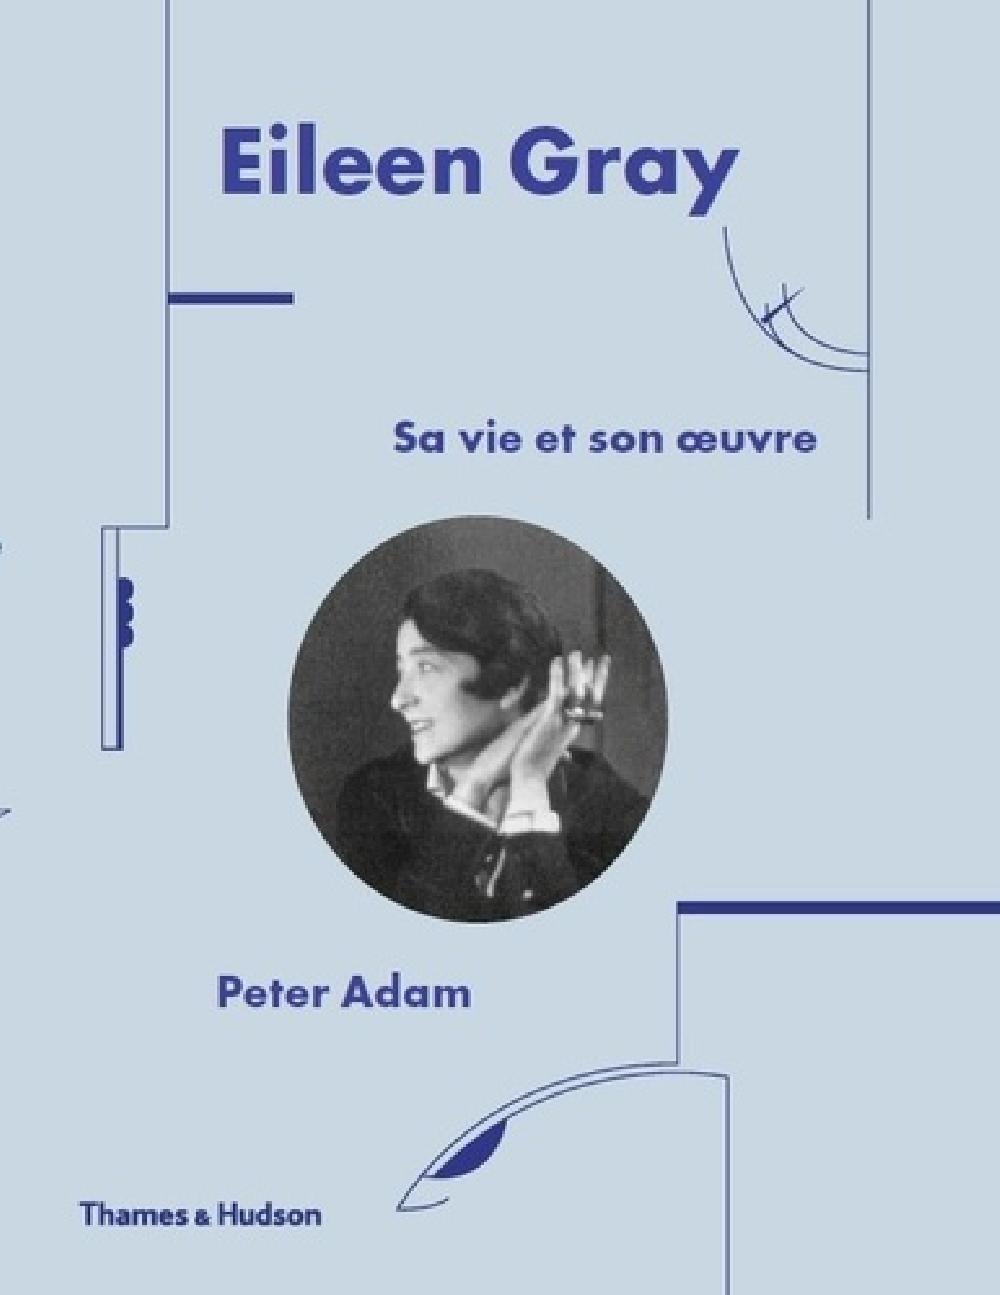 Eileen Gray - Sa vie et son oeuvre